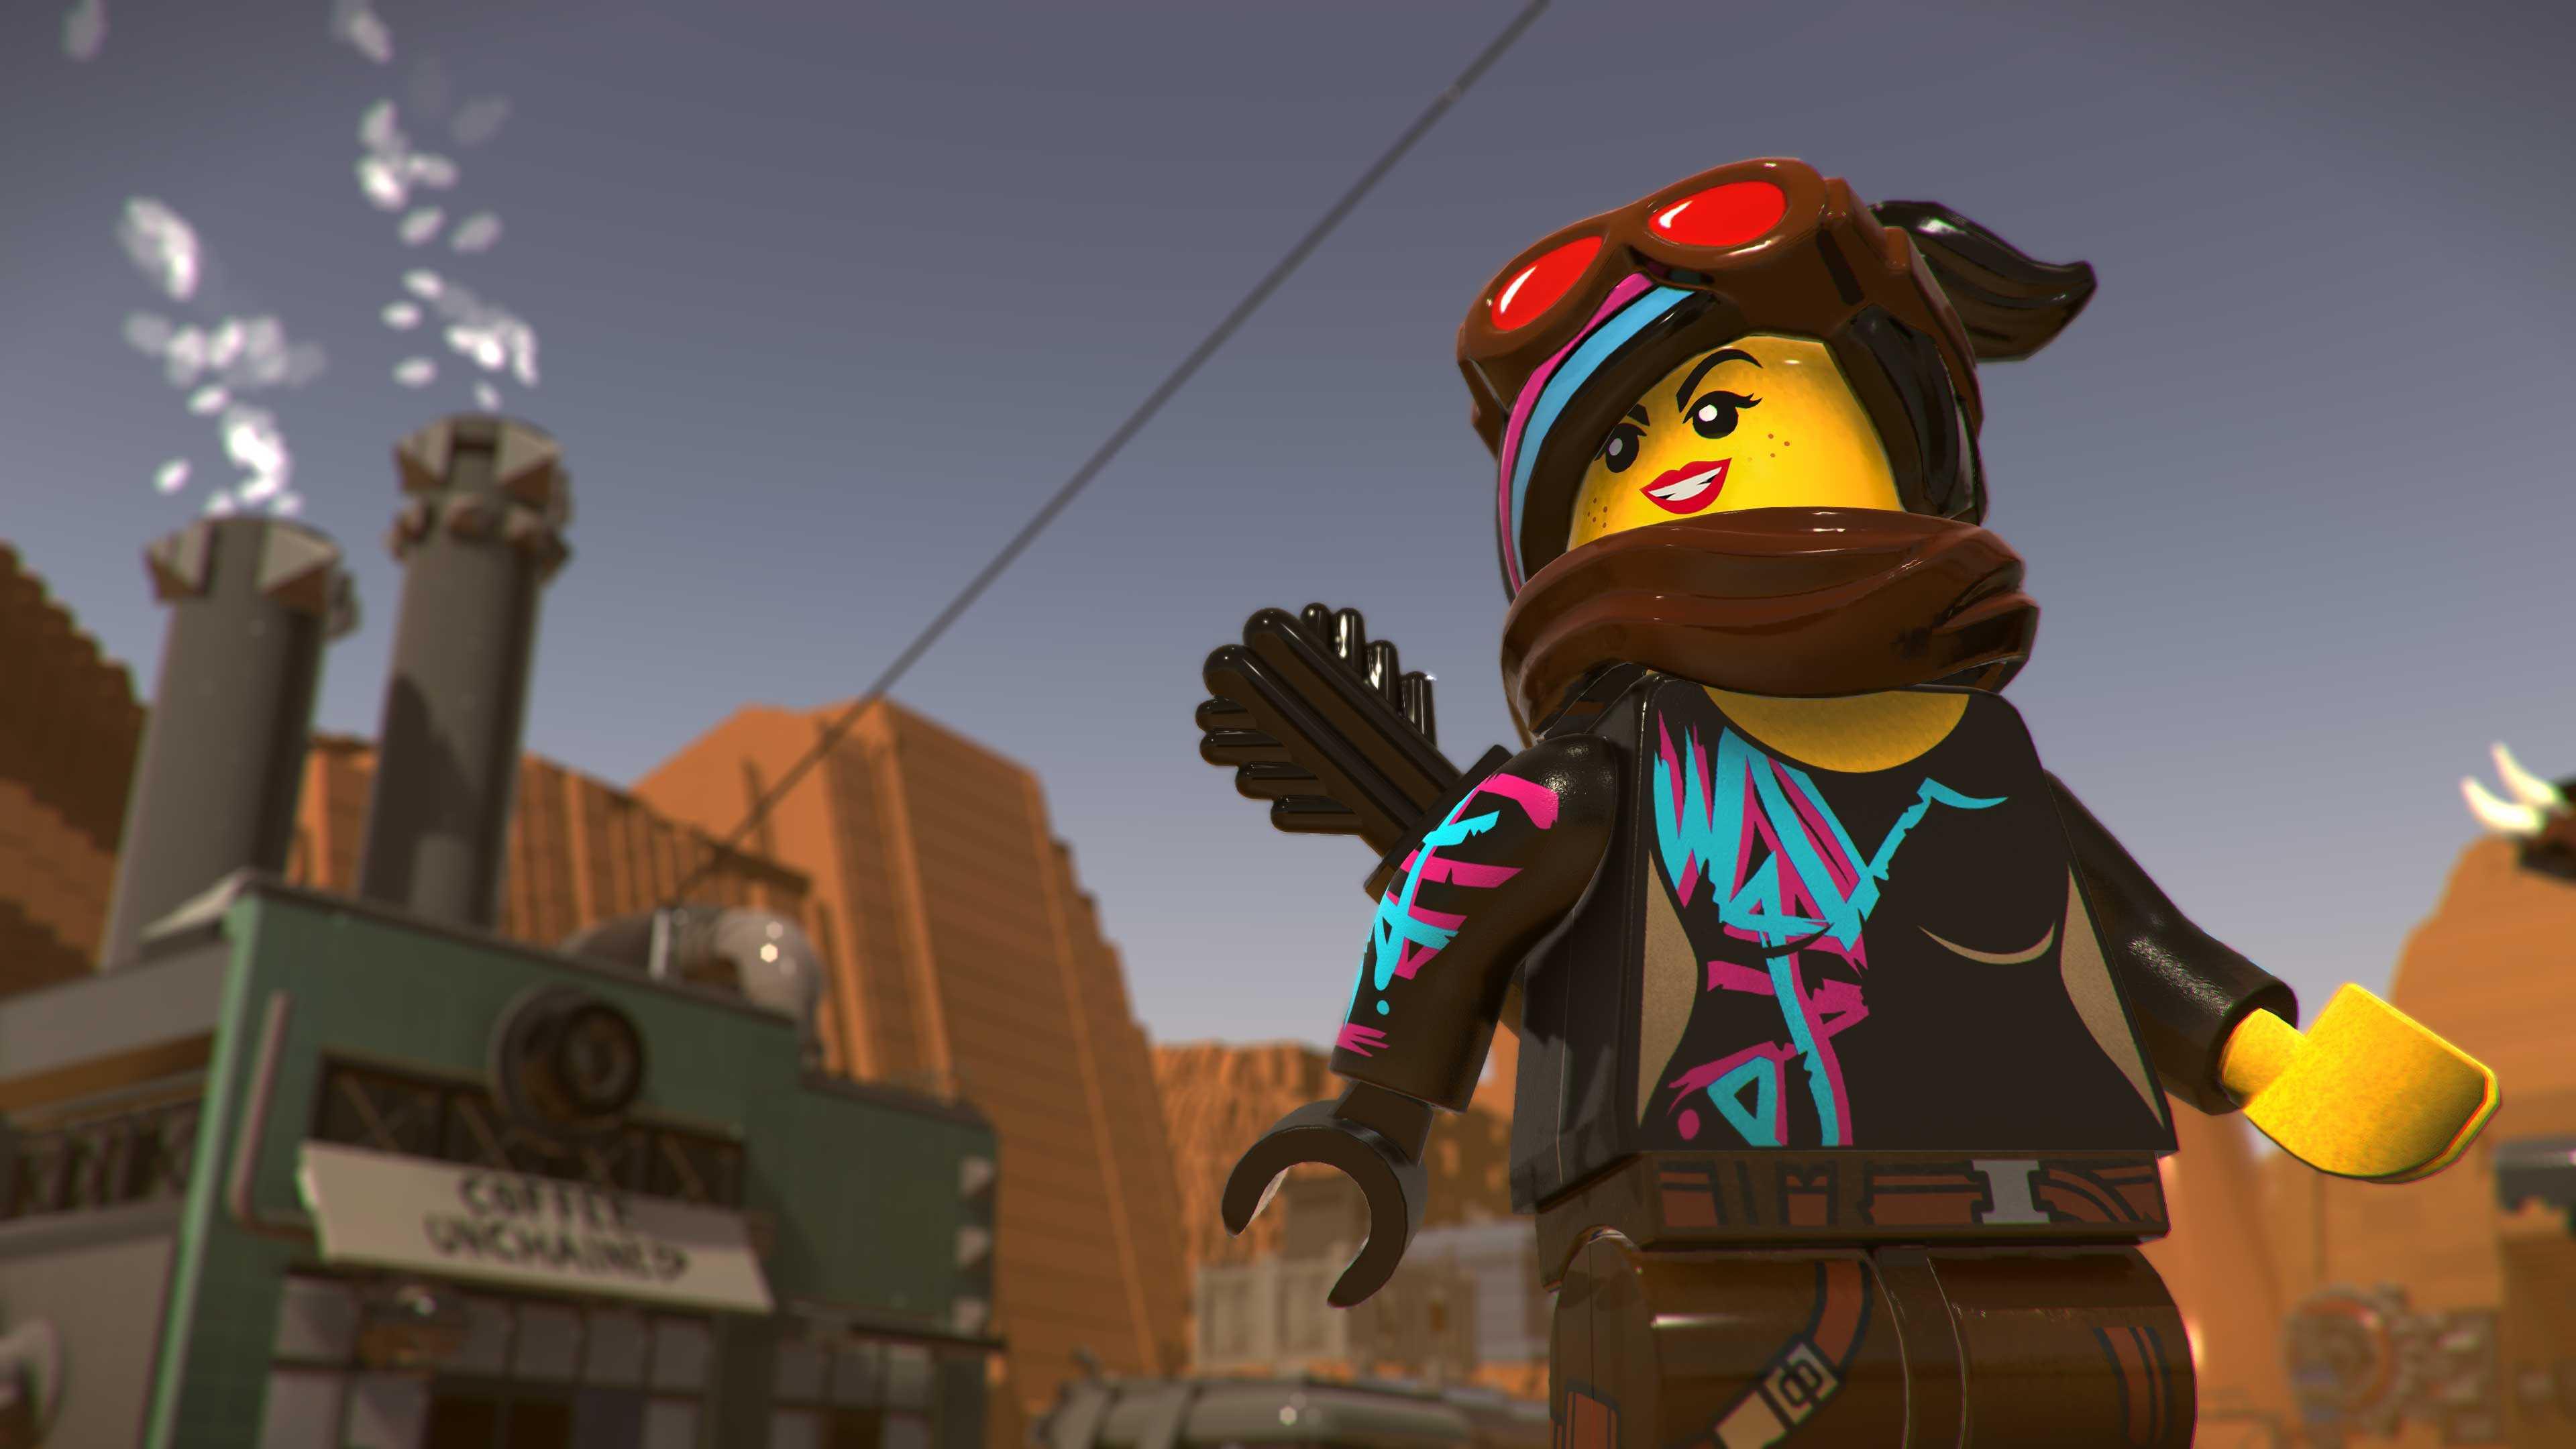 the lego movie 2 4k 1553074158 - The Lego Movie 2 4k - the lego movie 2 wallpapers, the lego movie 2 the second part wallpapers, movies wallpapers, hd-wallpapers, 4k-wallpapers, 2019 movies wallpapers